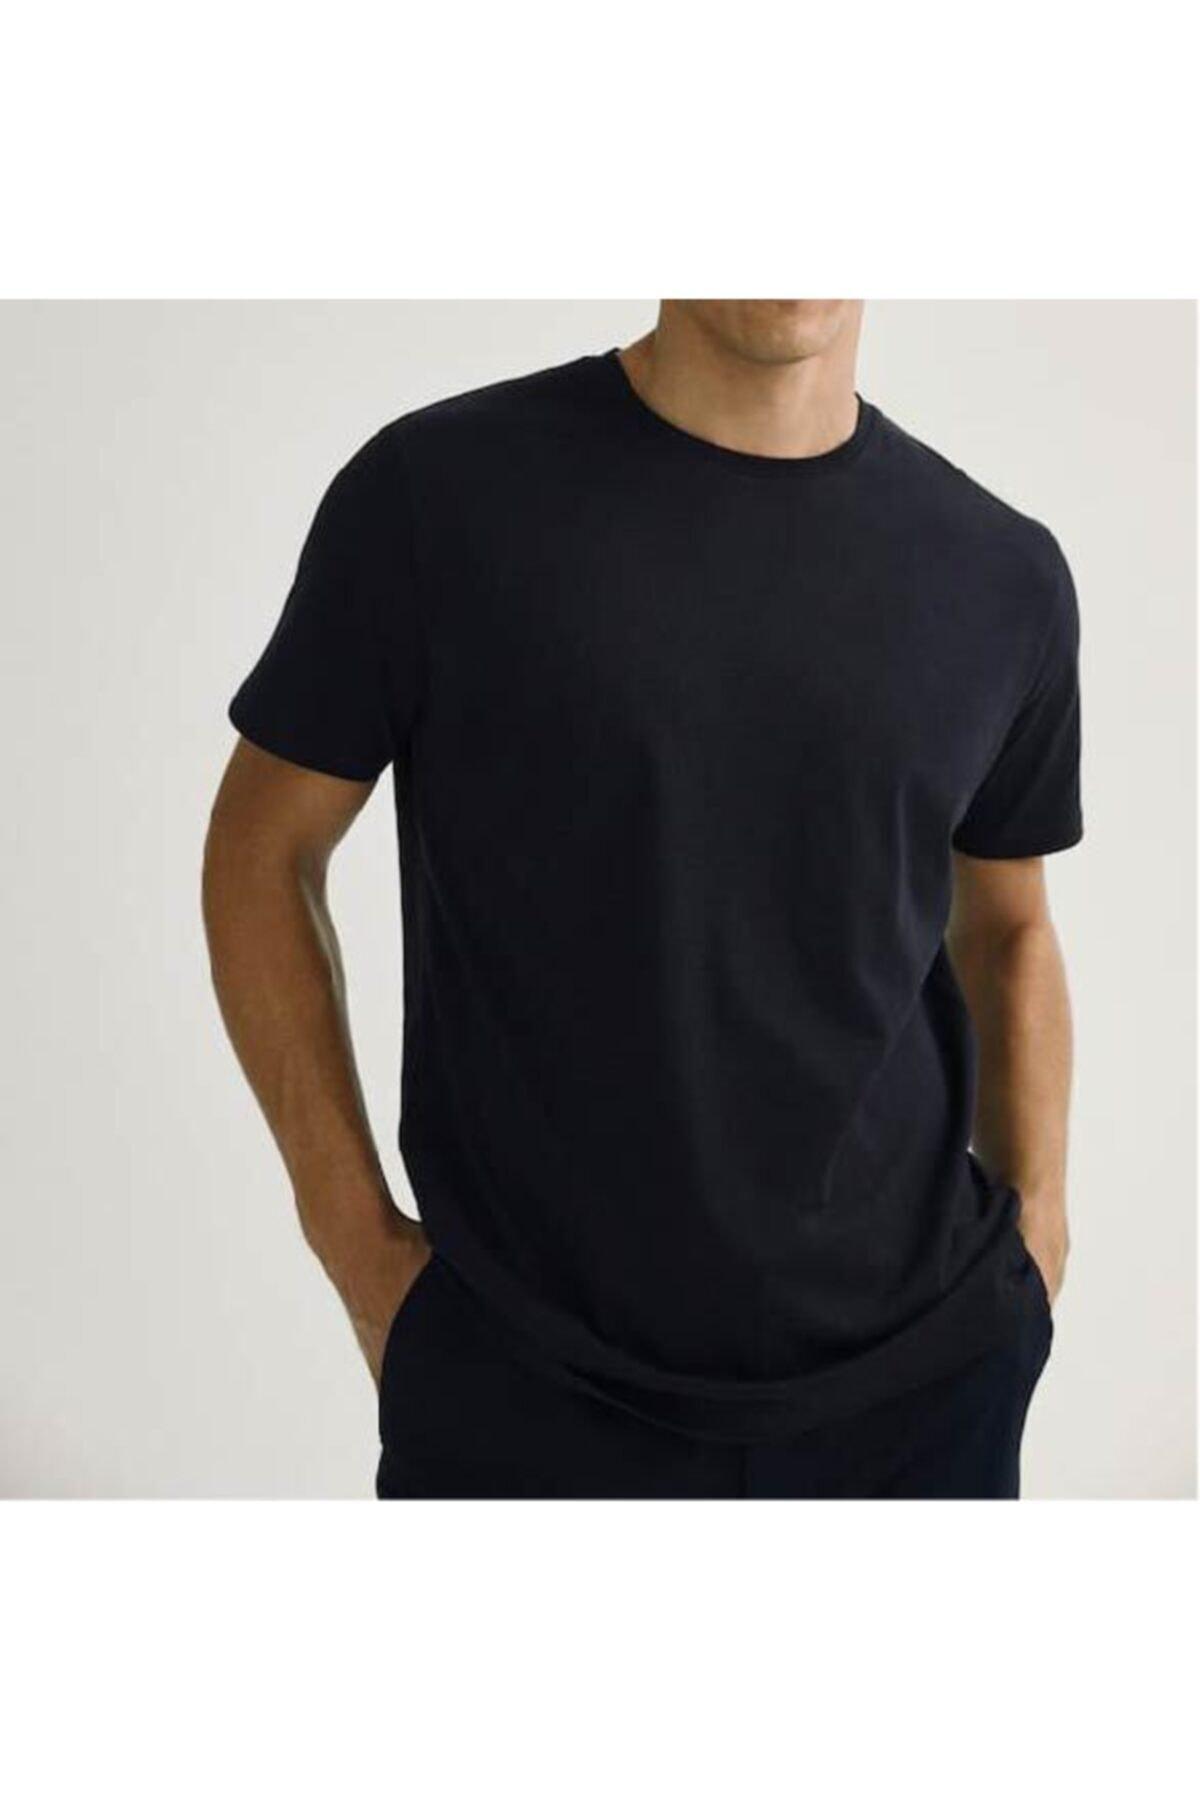 ROS Erkek Çok Renkli Casual Fit T-shirt 2'li Paket 2